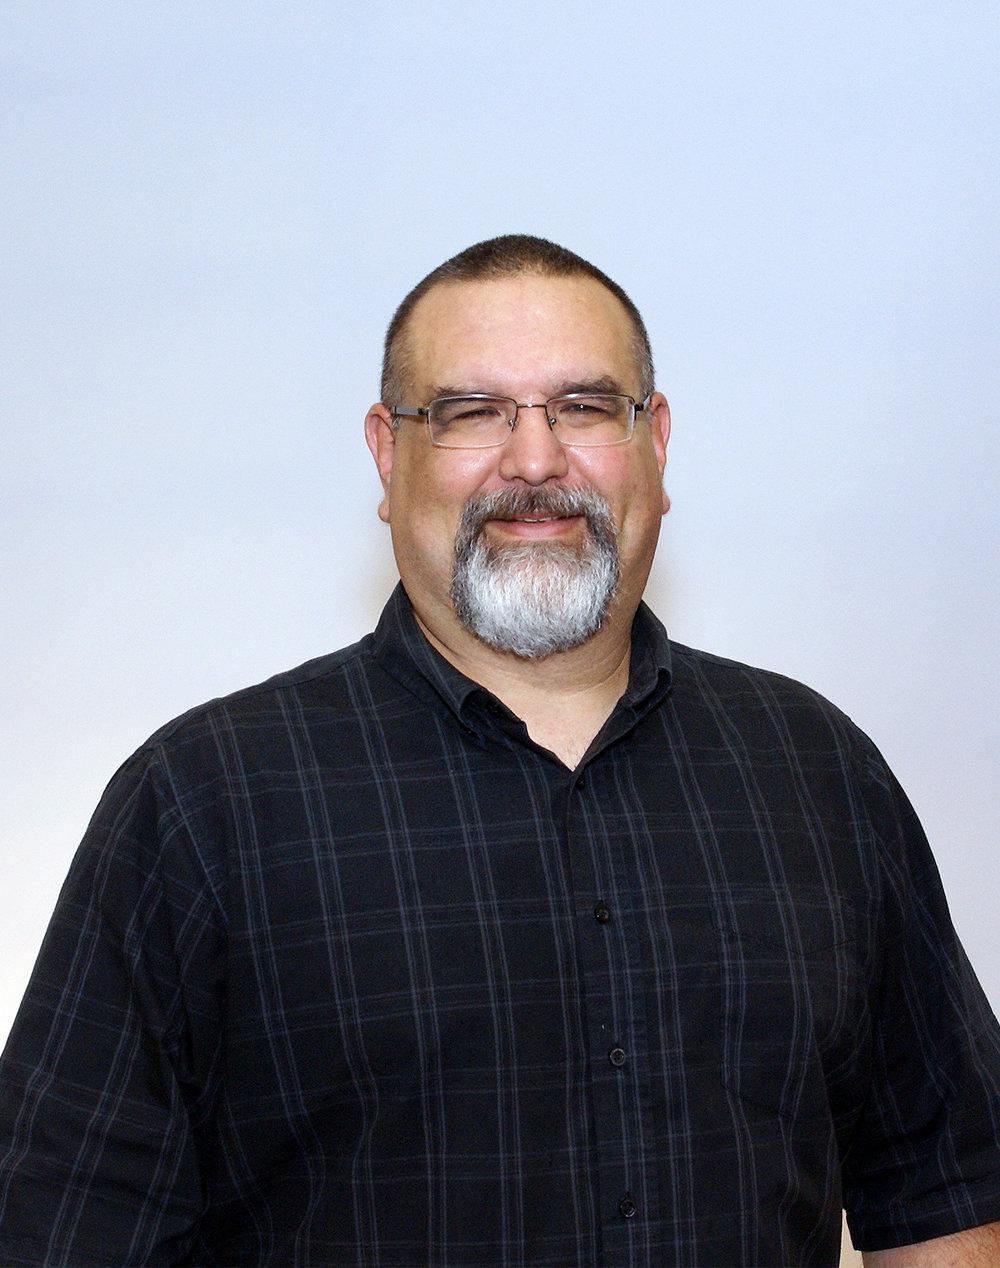 Vice Chair Steve Spalinger